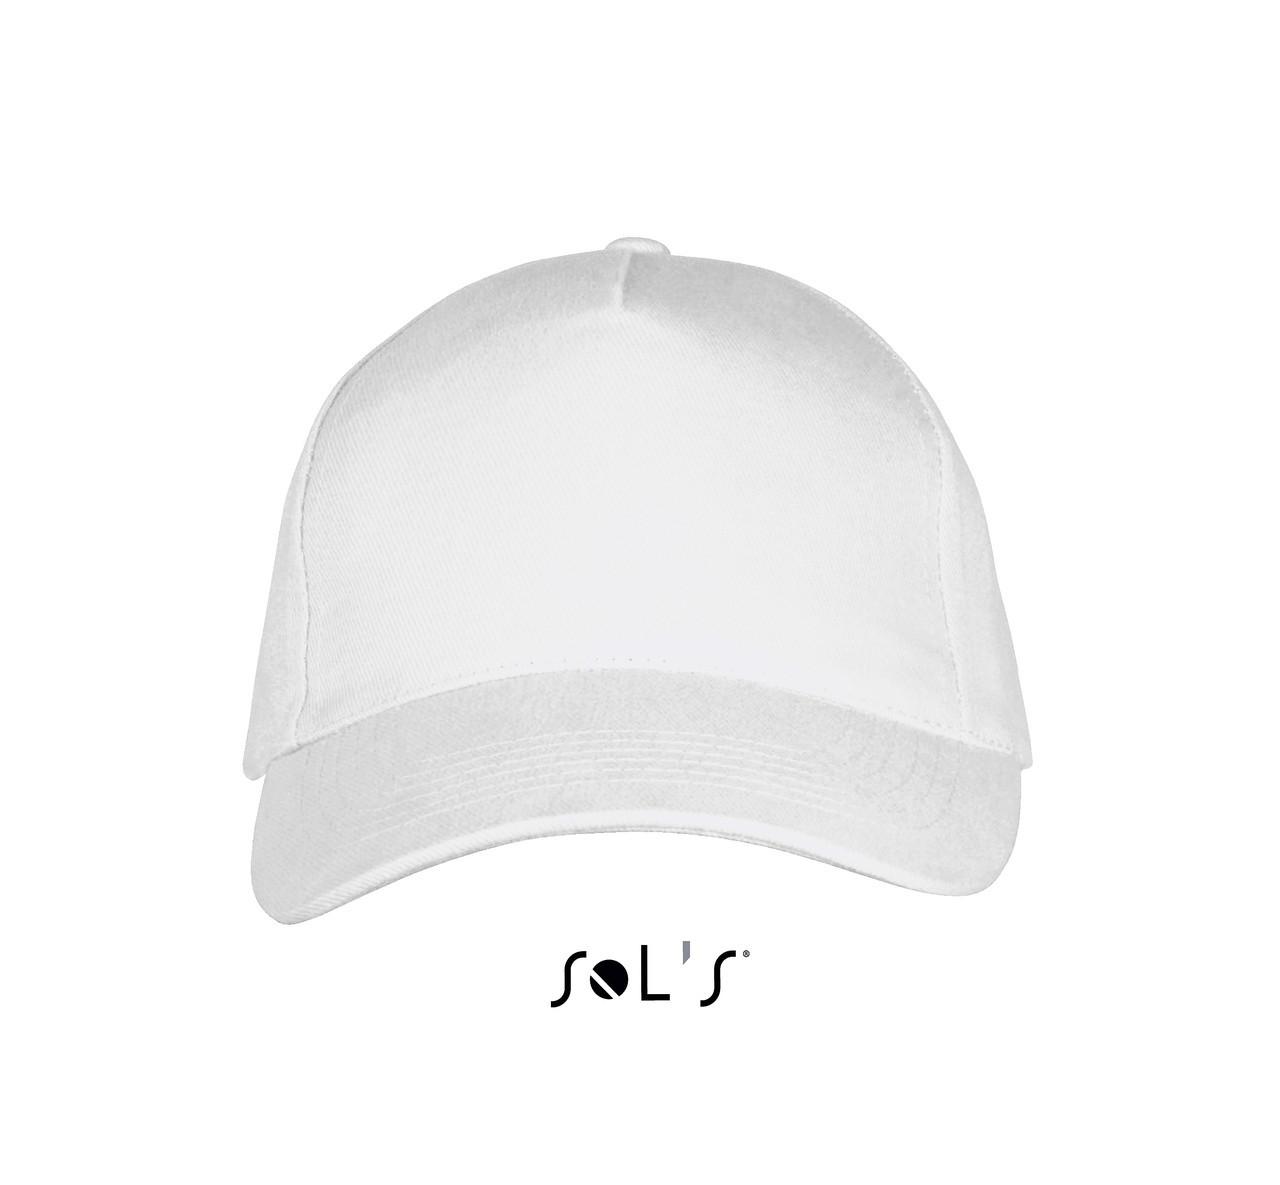 LONG BEACH кепка 5-ти панельная, цвет белый